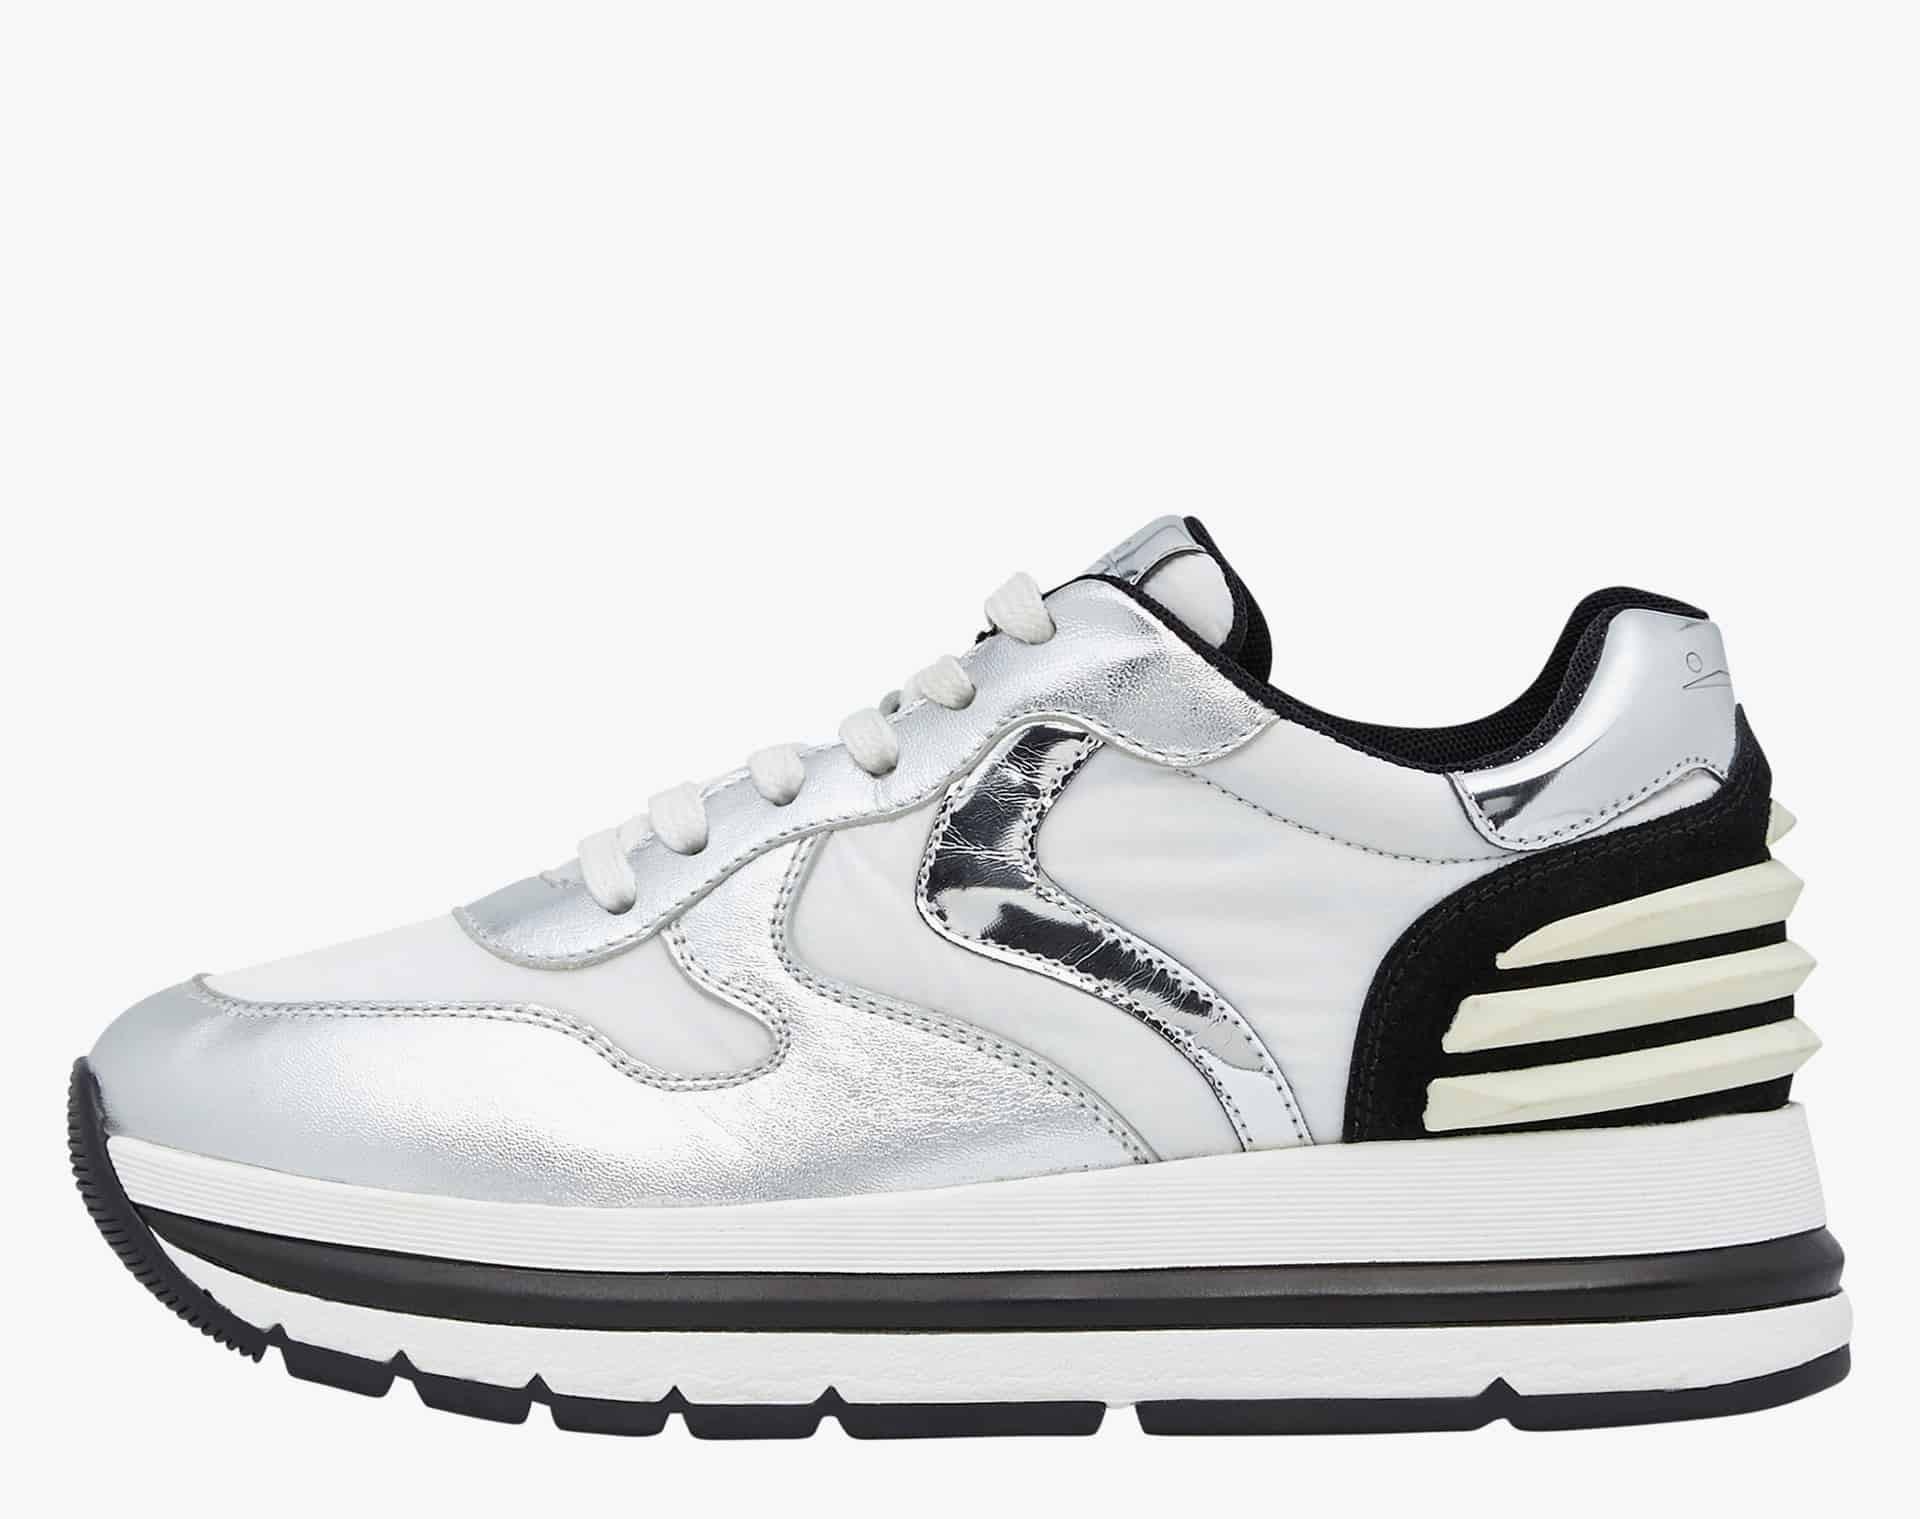 MARAN POWER - Sneaker in nappa laminata e tessuto tecnico - Argento